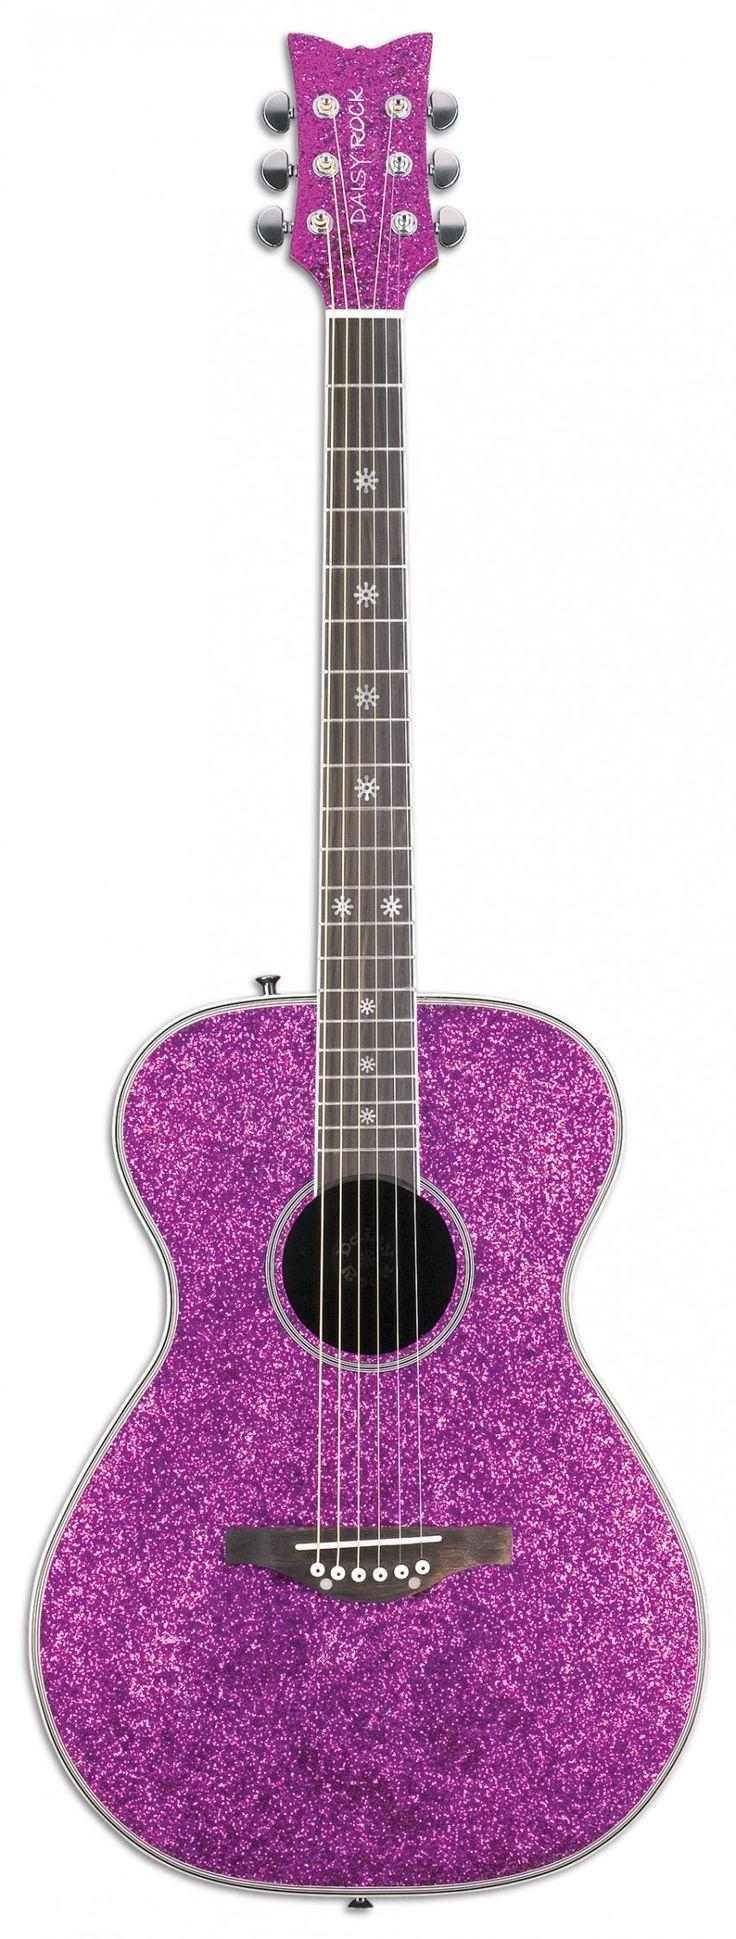 57 best images about acoustic daisy rock guitars on pinterest sparkle acoustic guitars and. Black Bedroom Furniture Sets. Home Design Ideas